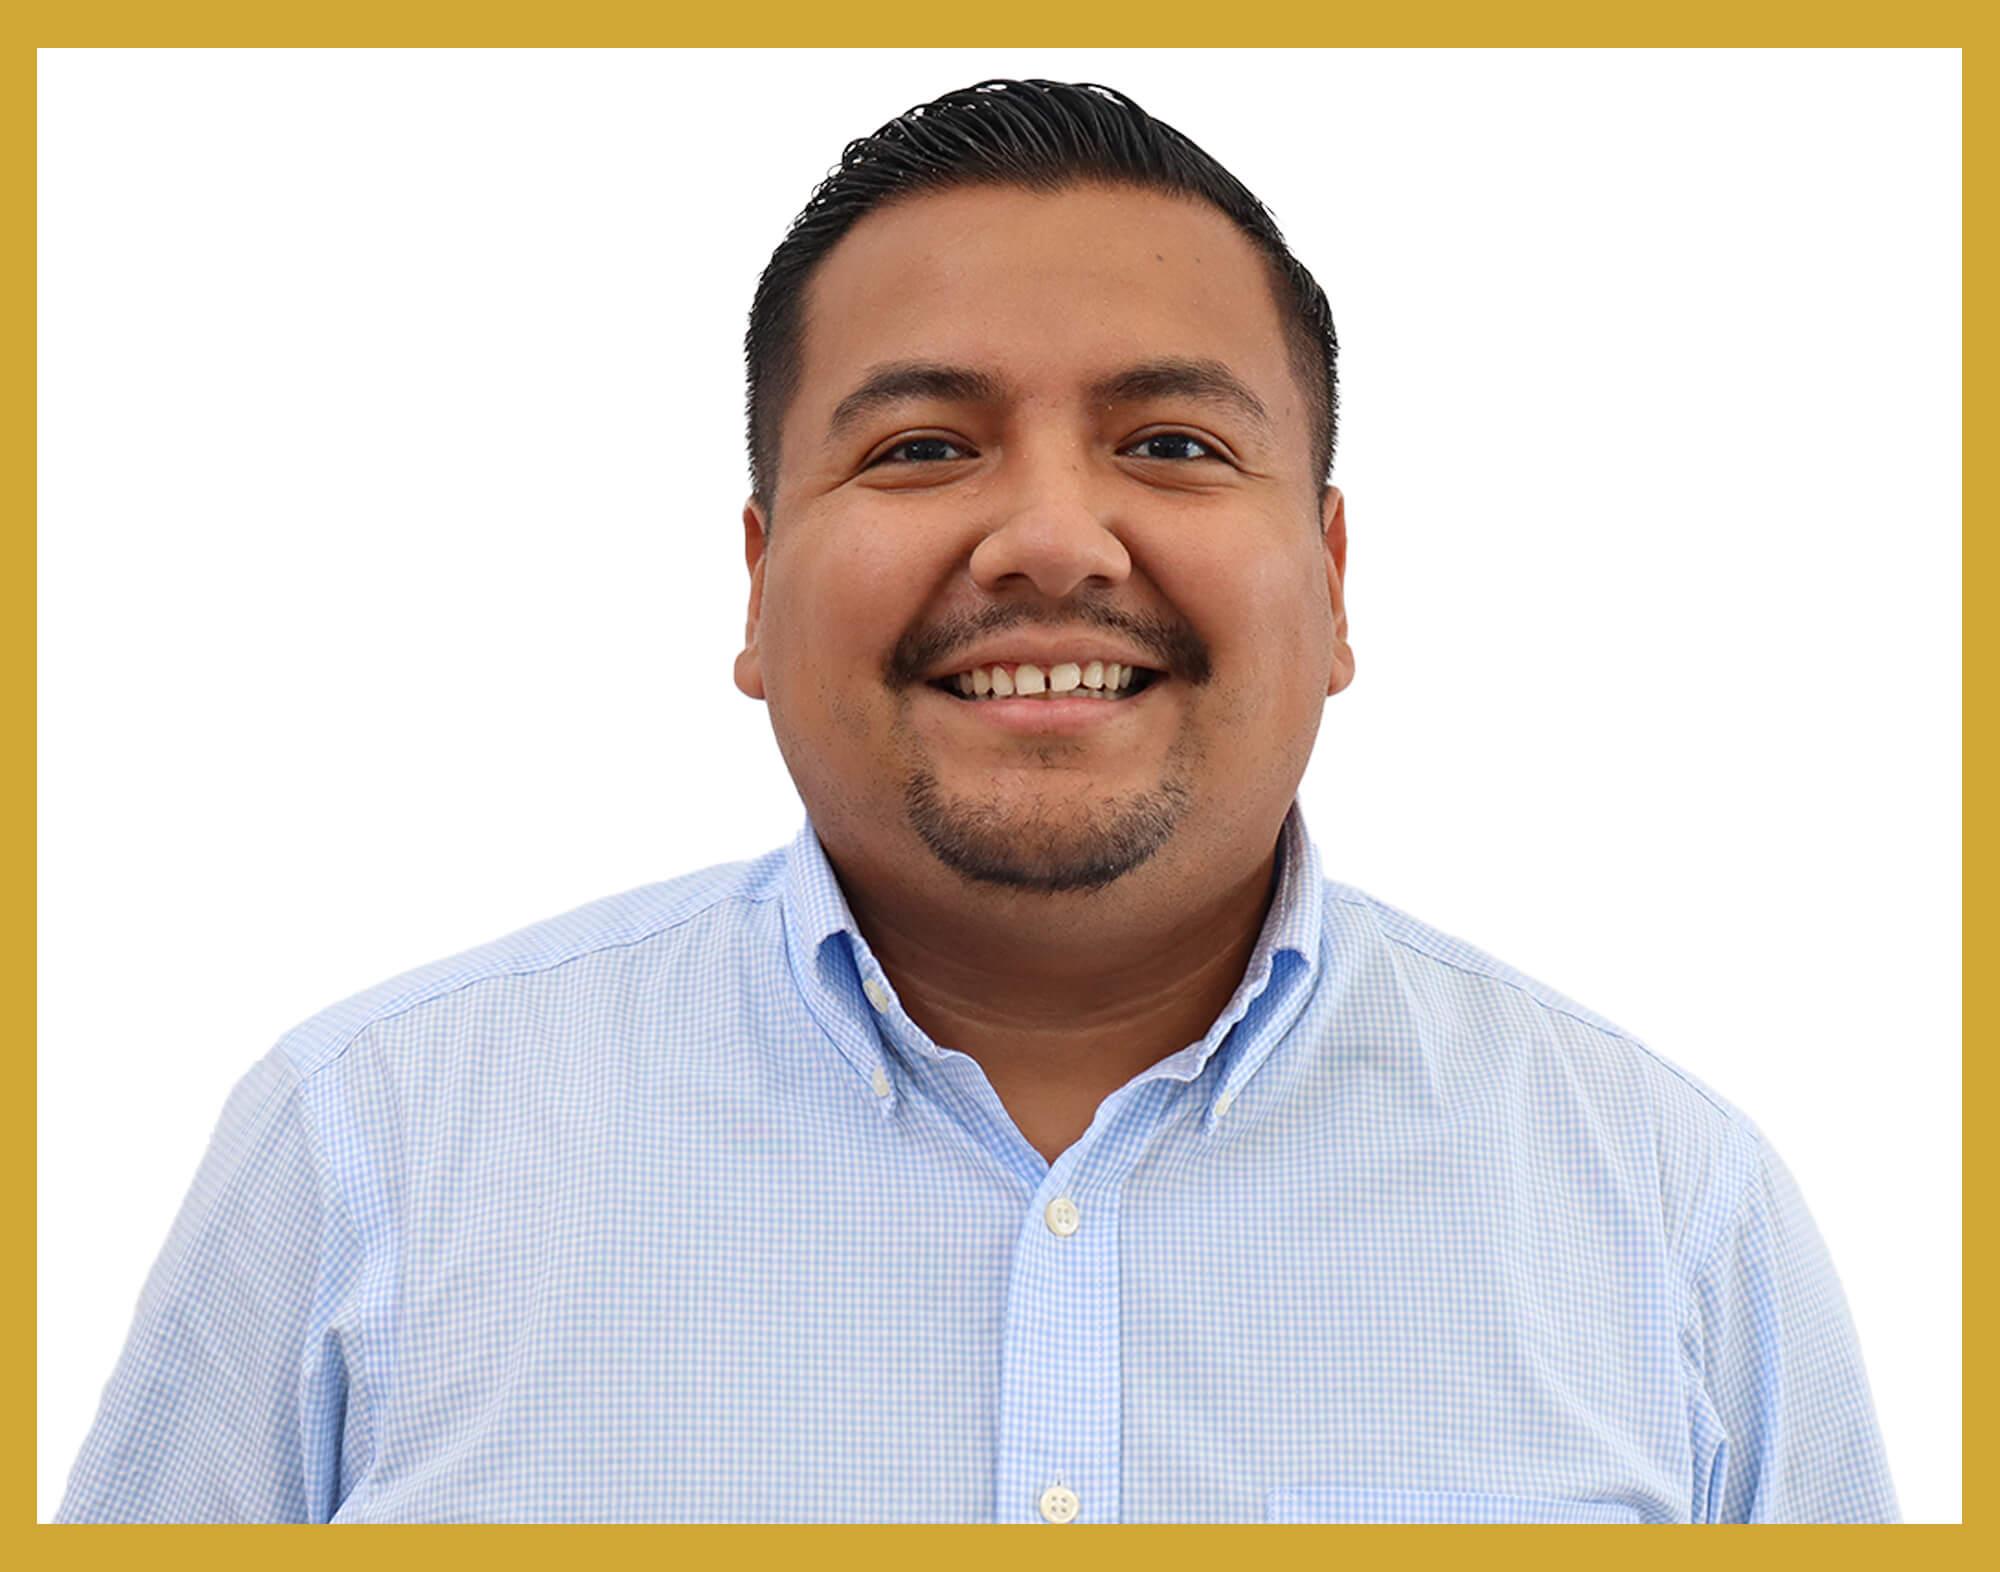 Elliott Morales-Amaya